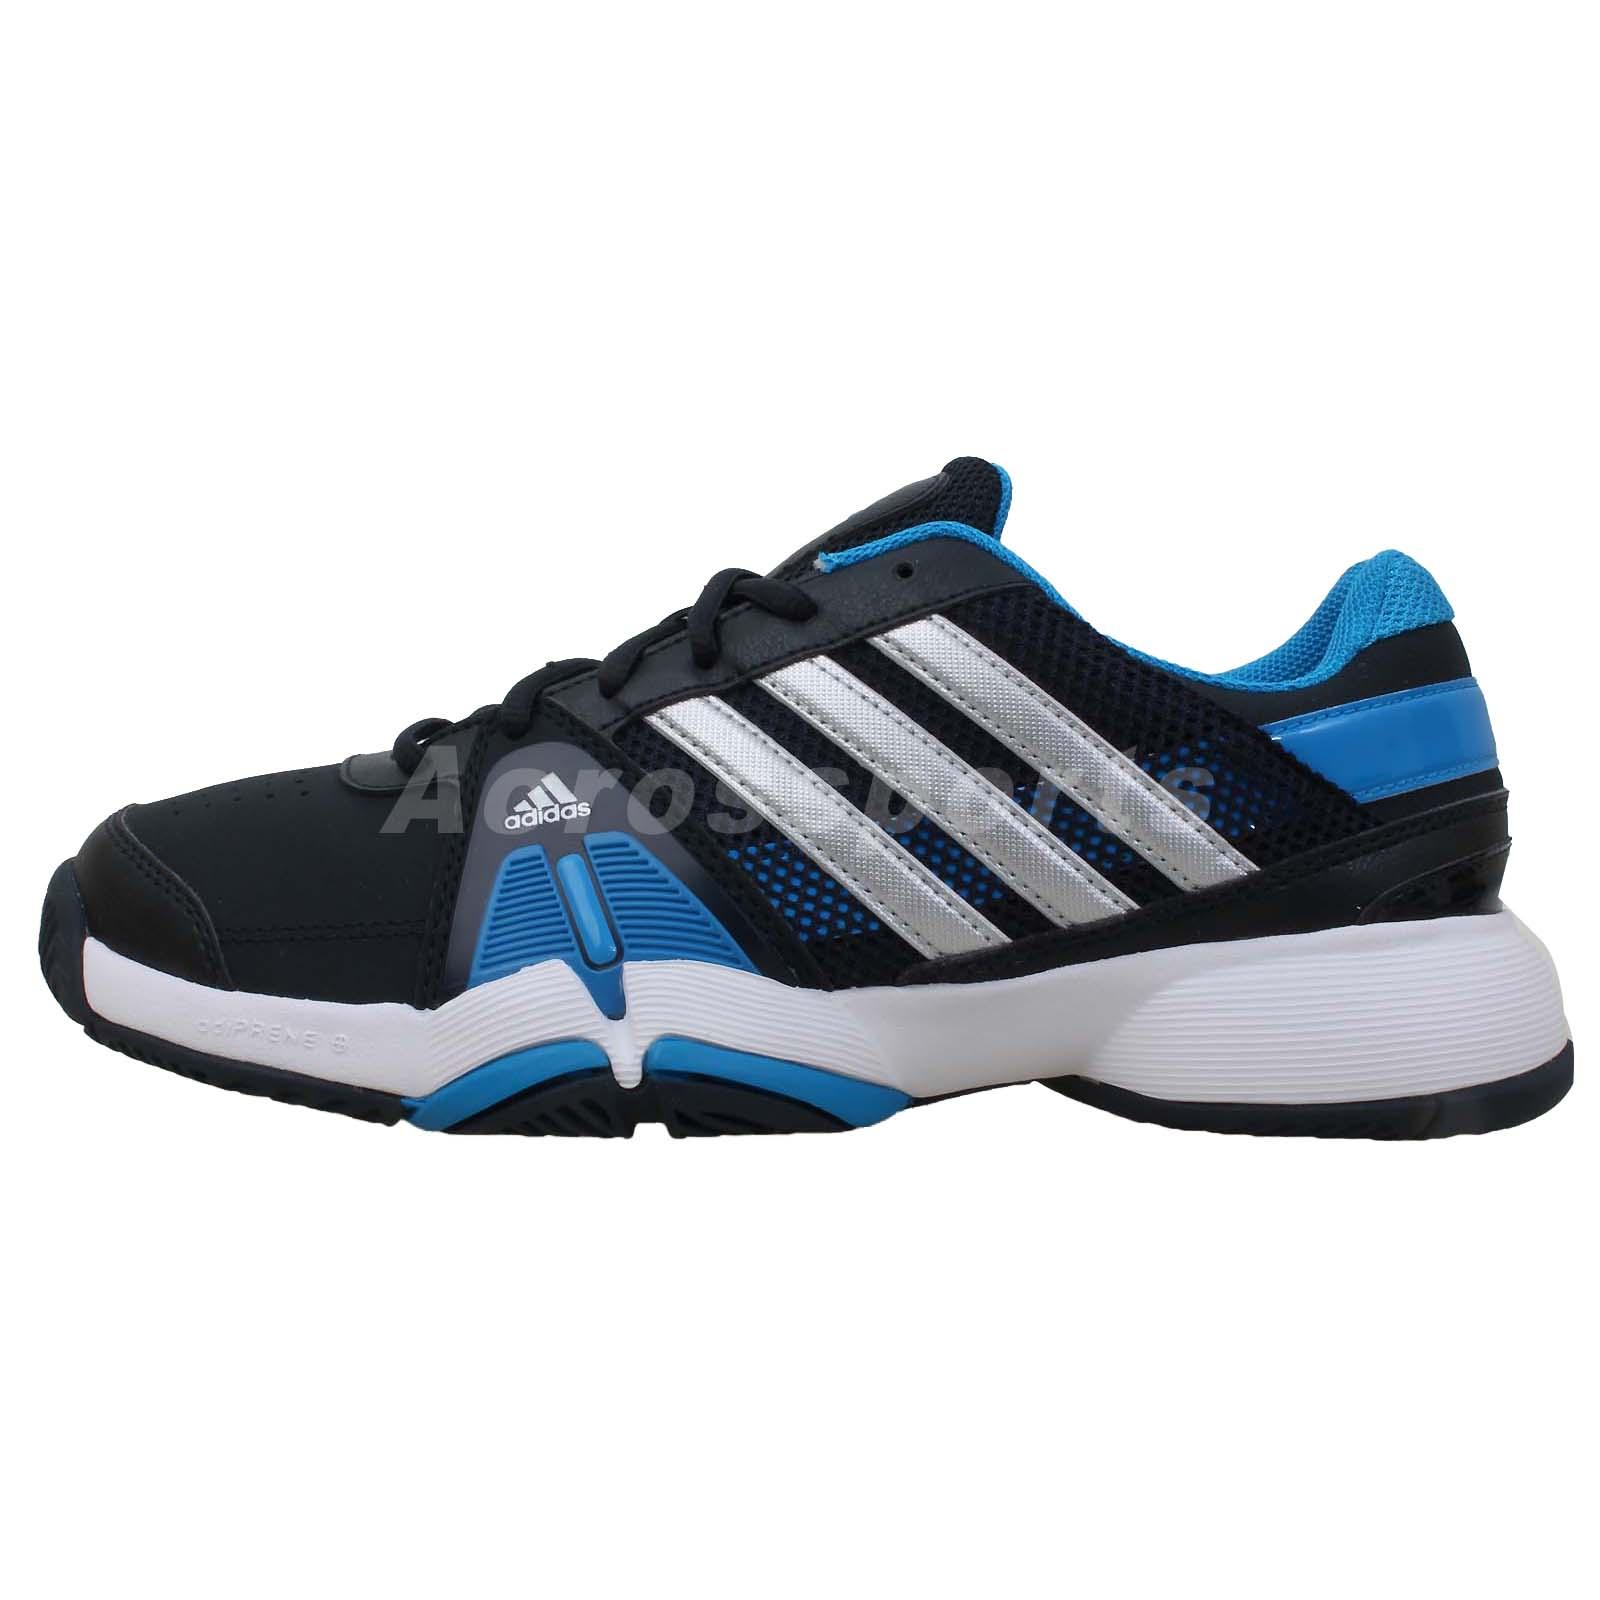 adidas barricade team 3 2014 new black silver blue mens